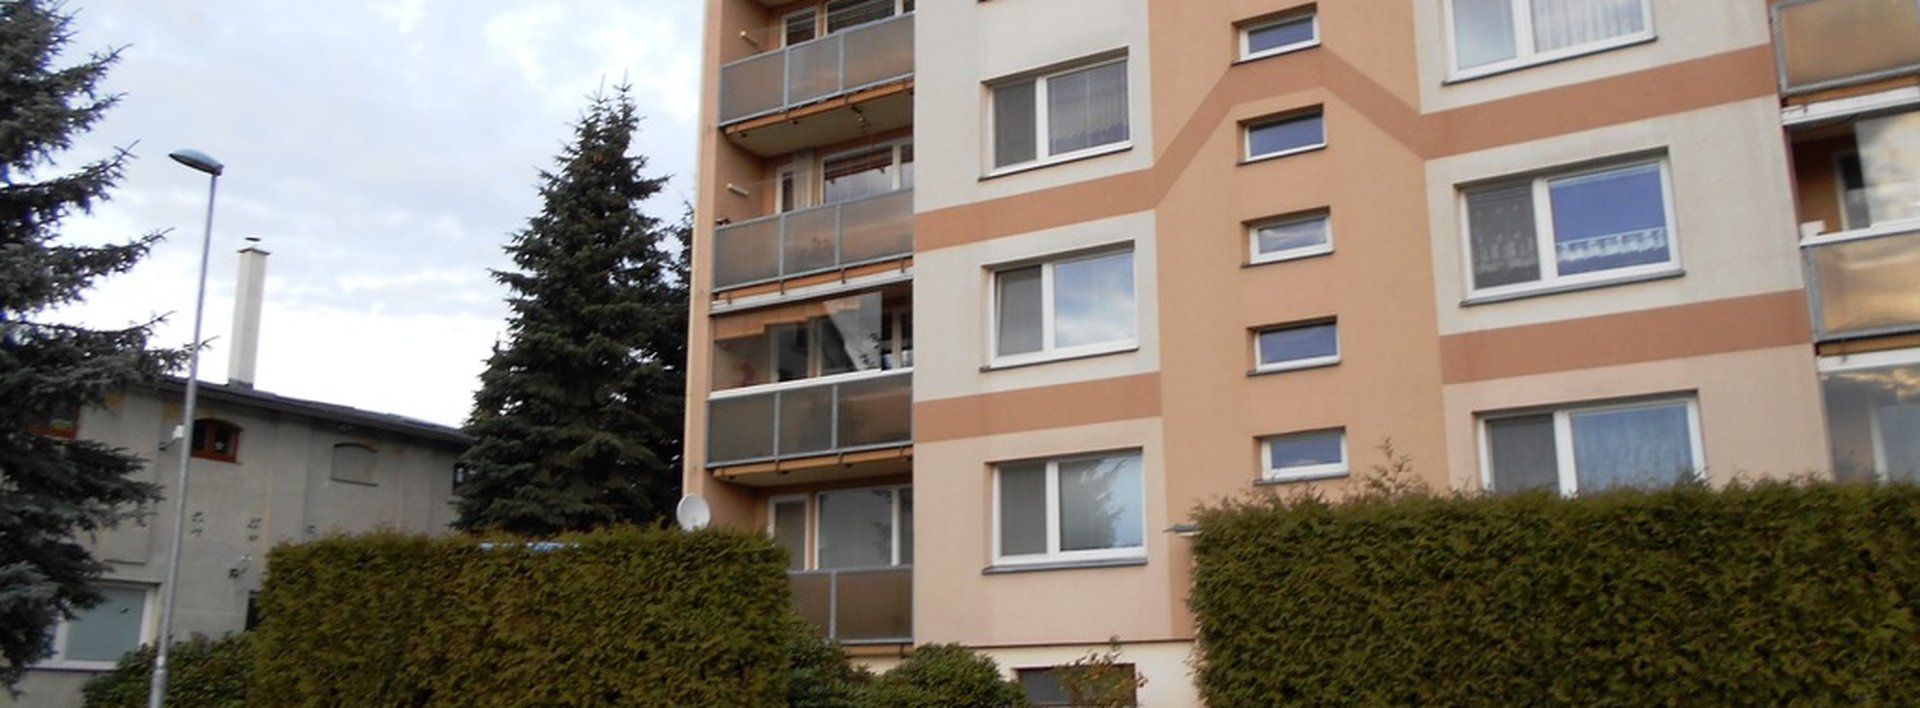 Prodej bytu 3+1 s lodžií v Hrádku nad Nisou, Ev.č.: N47498